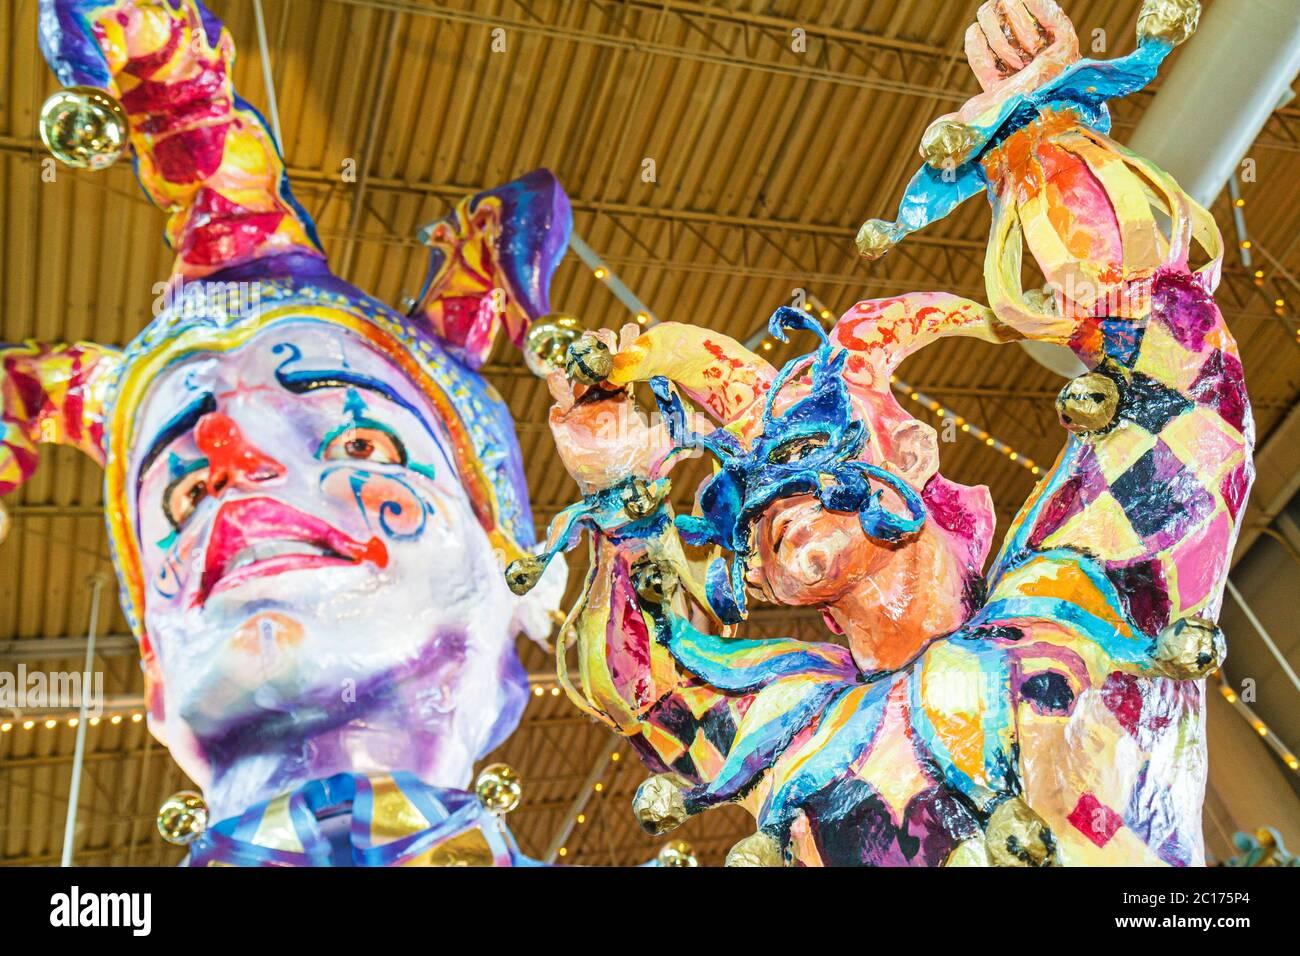 Louisiana, LA, South, Orleans Parish, New Orleans, Port of New Orleans, Riverwalk Marketplace, Mardi Gras Theme, decor, interior design, carnival, mas Stock Photo